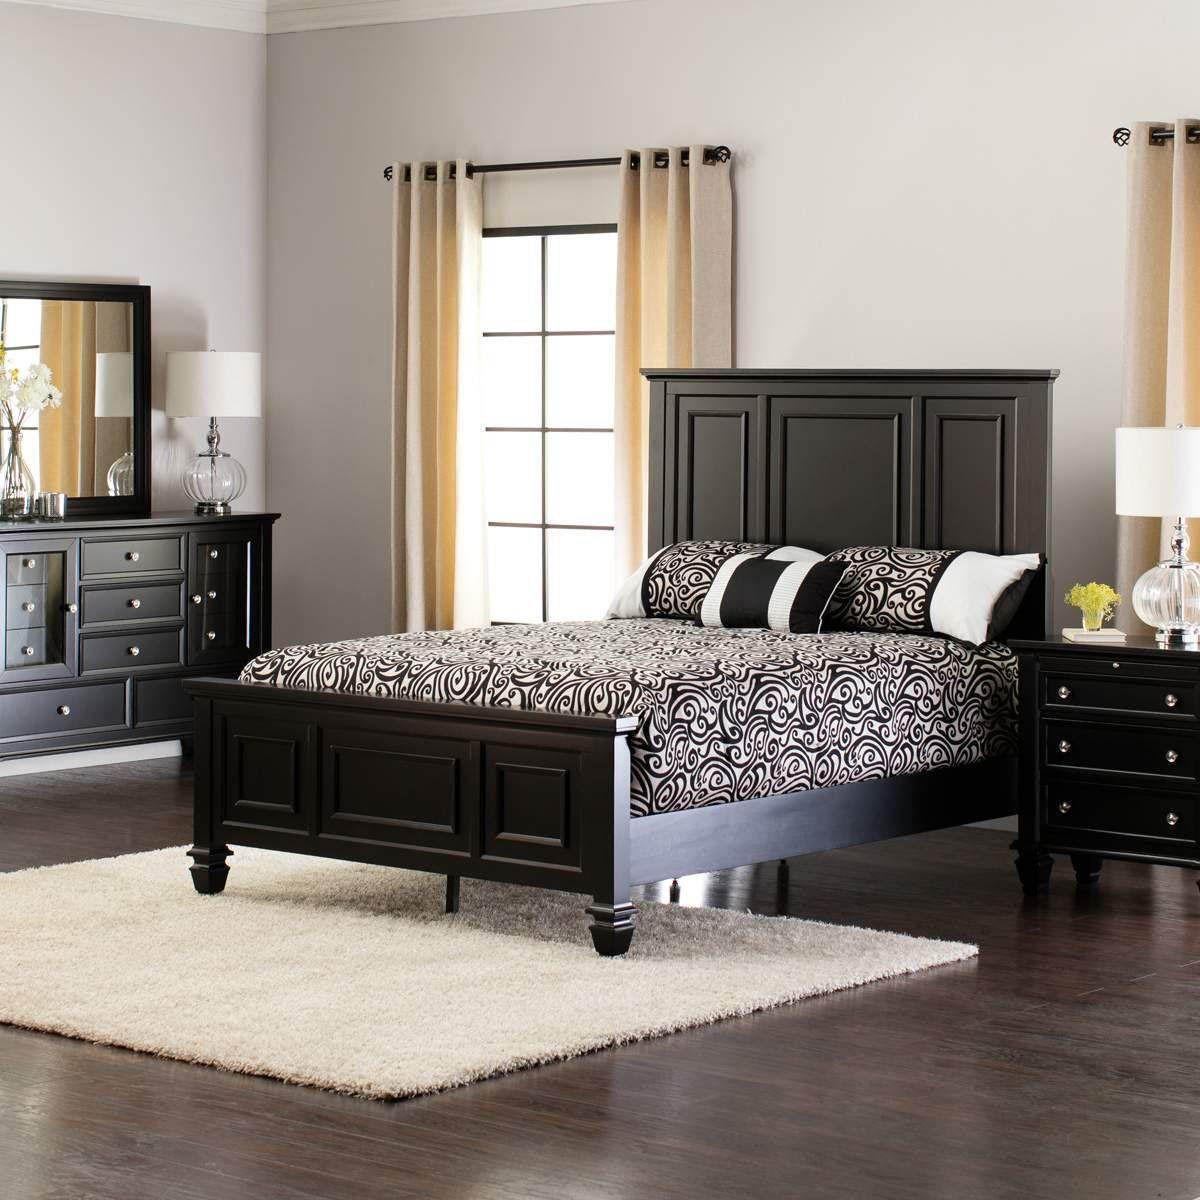 Masculine Bedroom Ideas Evoking Style Bedroom furniture